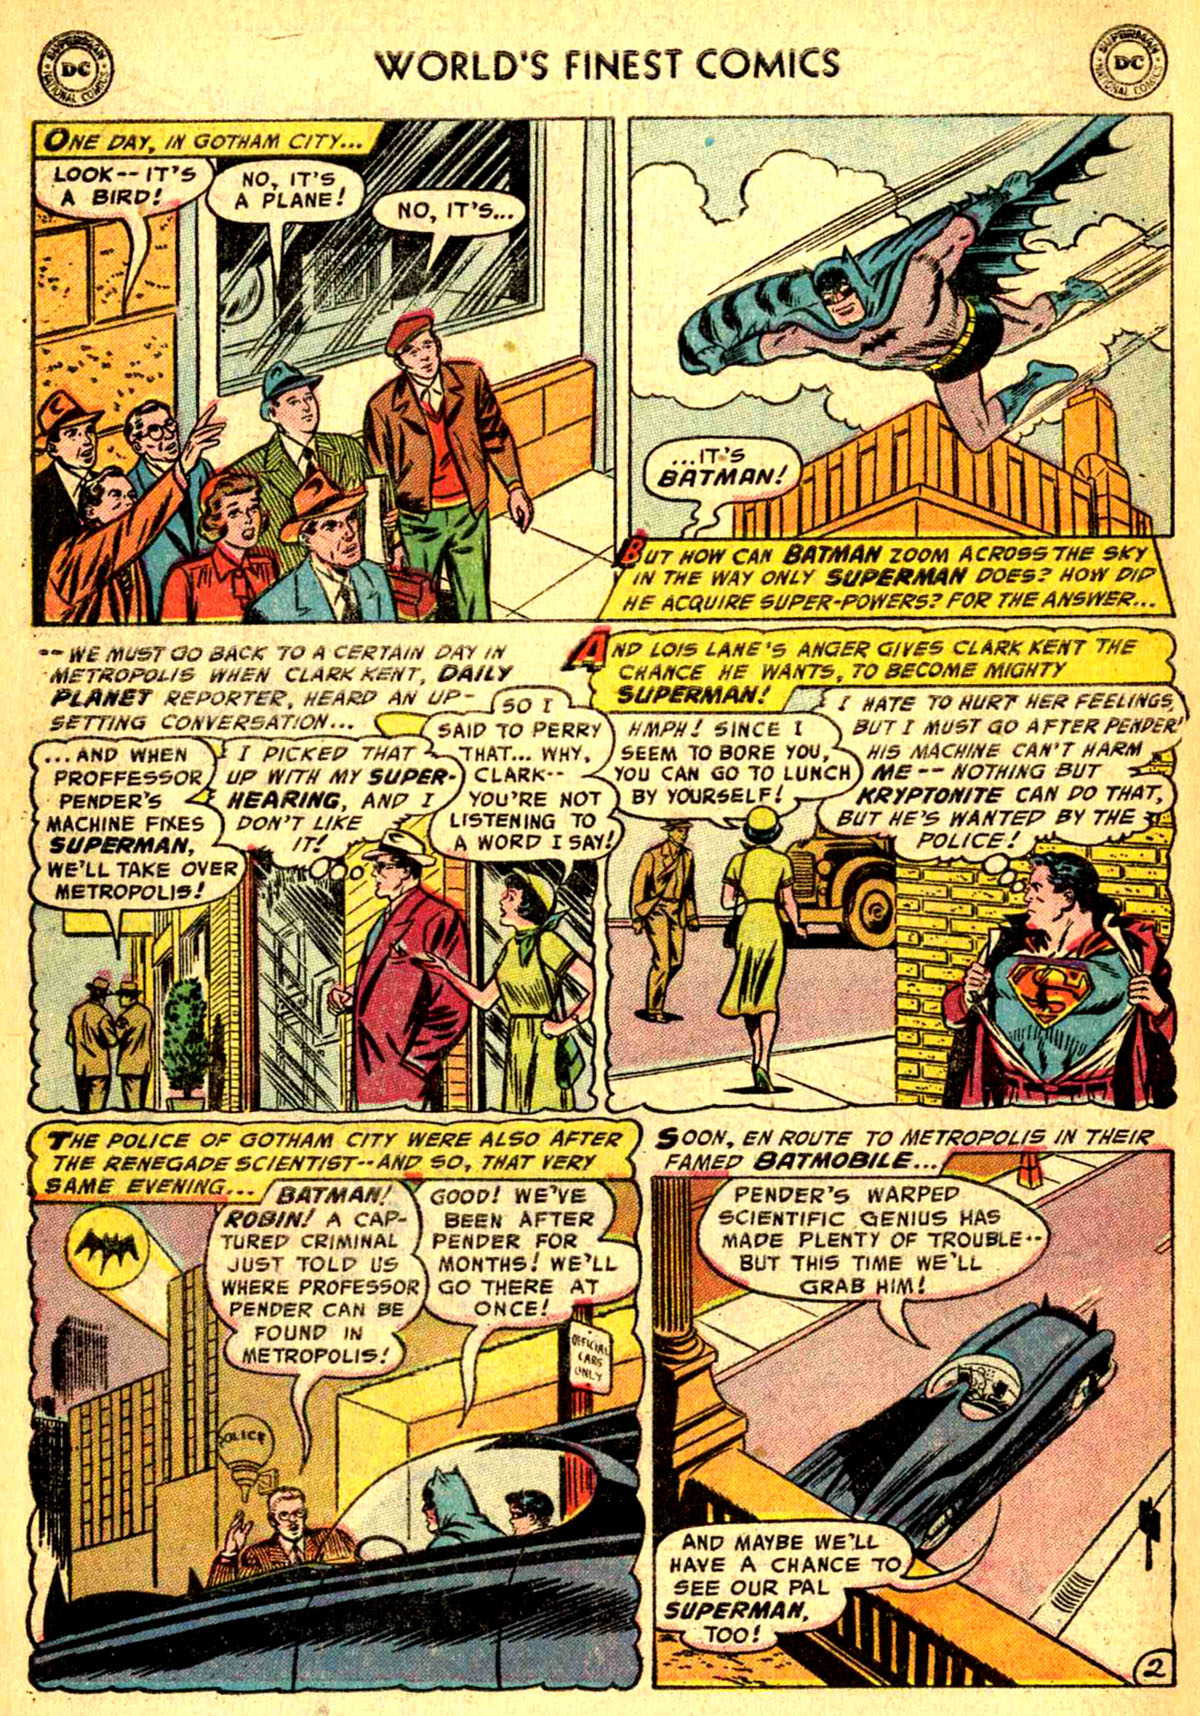 Read online World's Finest Comics comic -  Issue #77 - 4